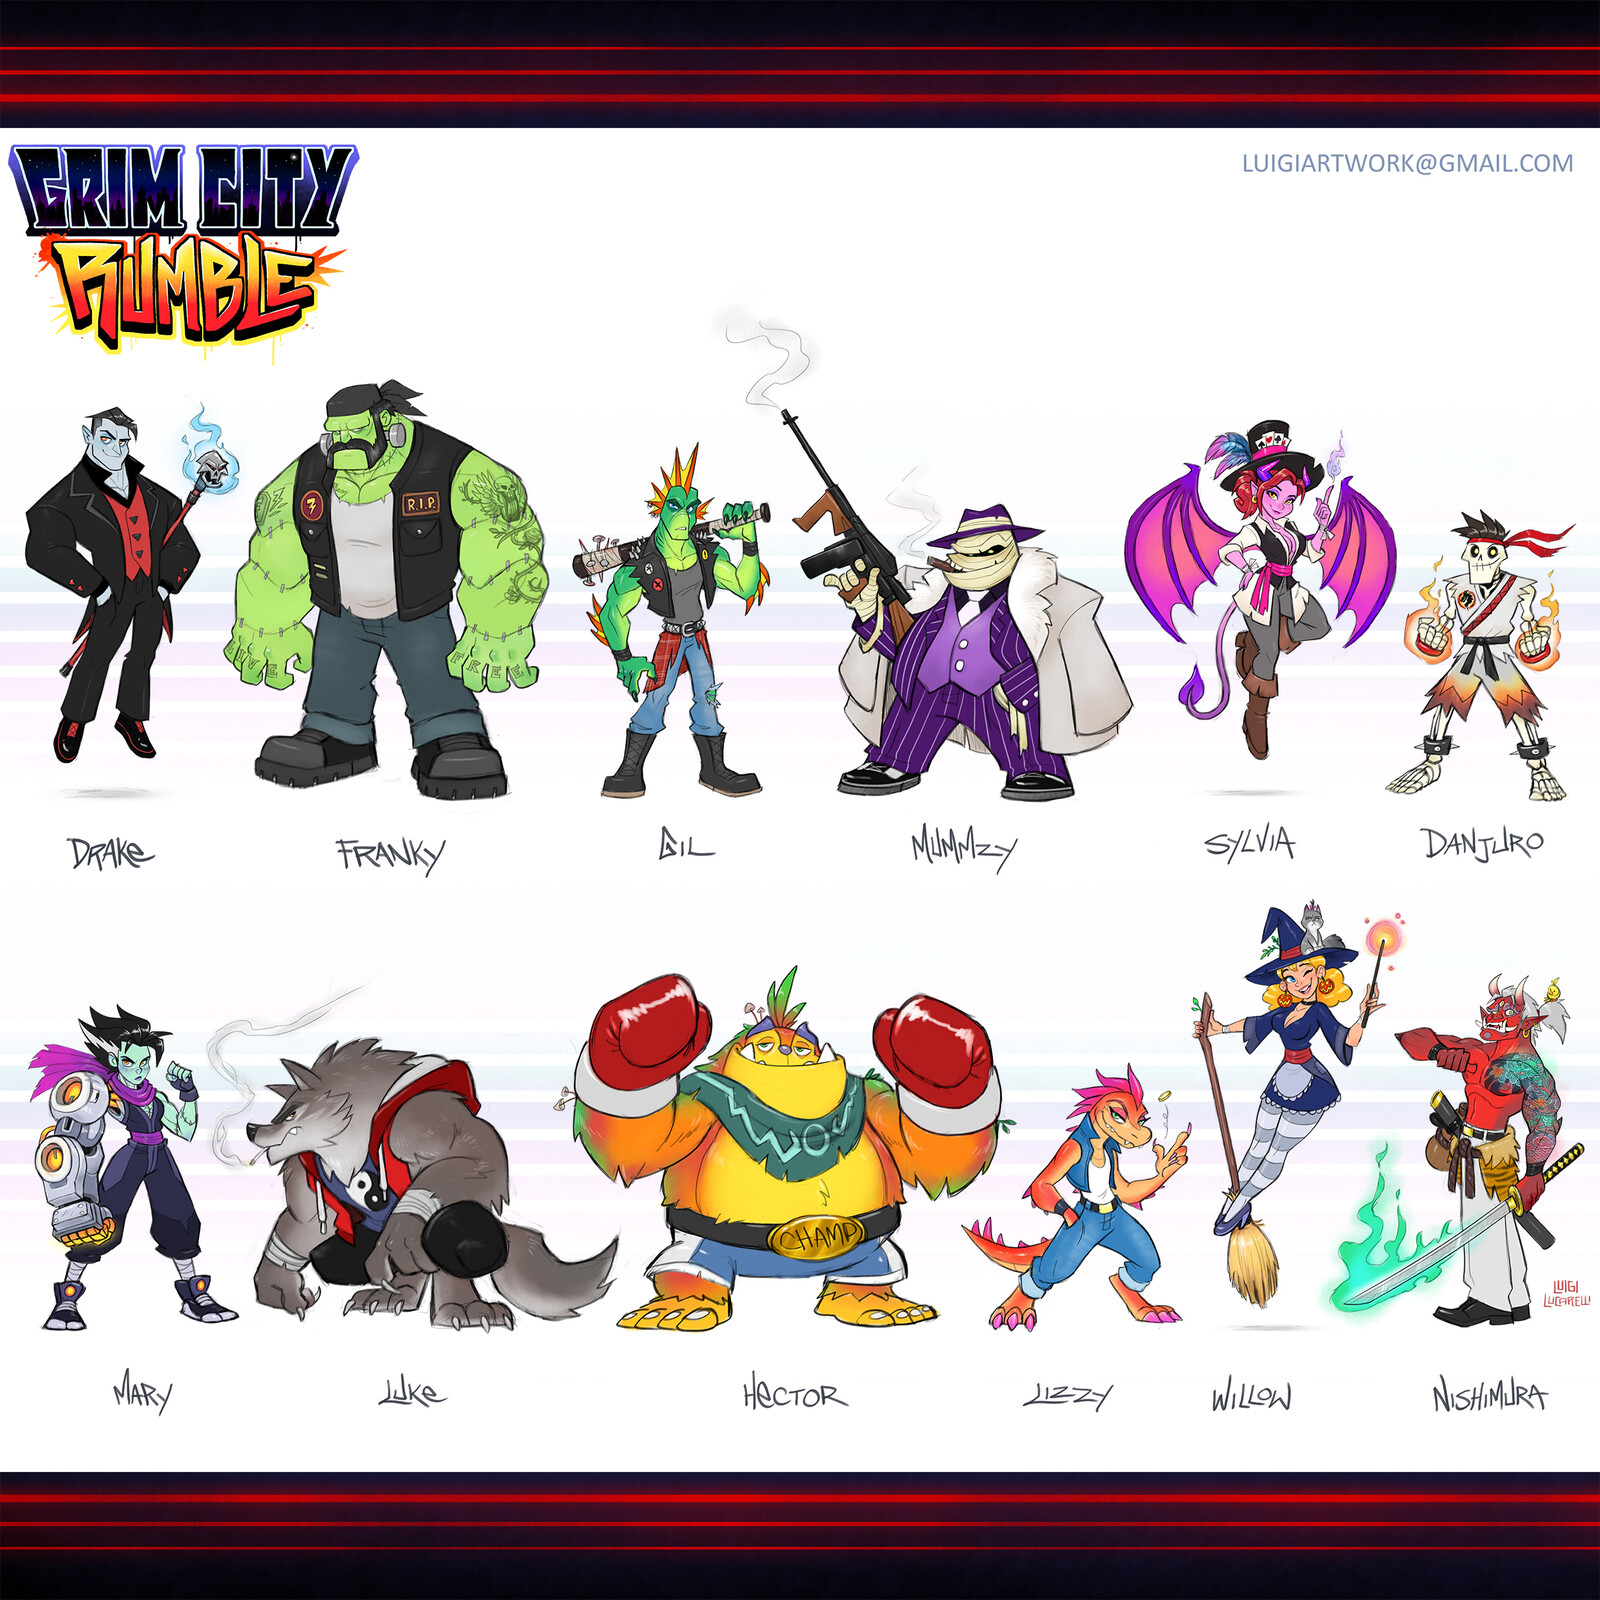 Grim City Rumble